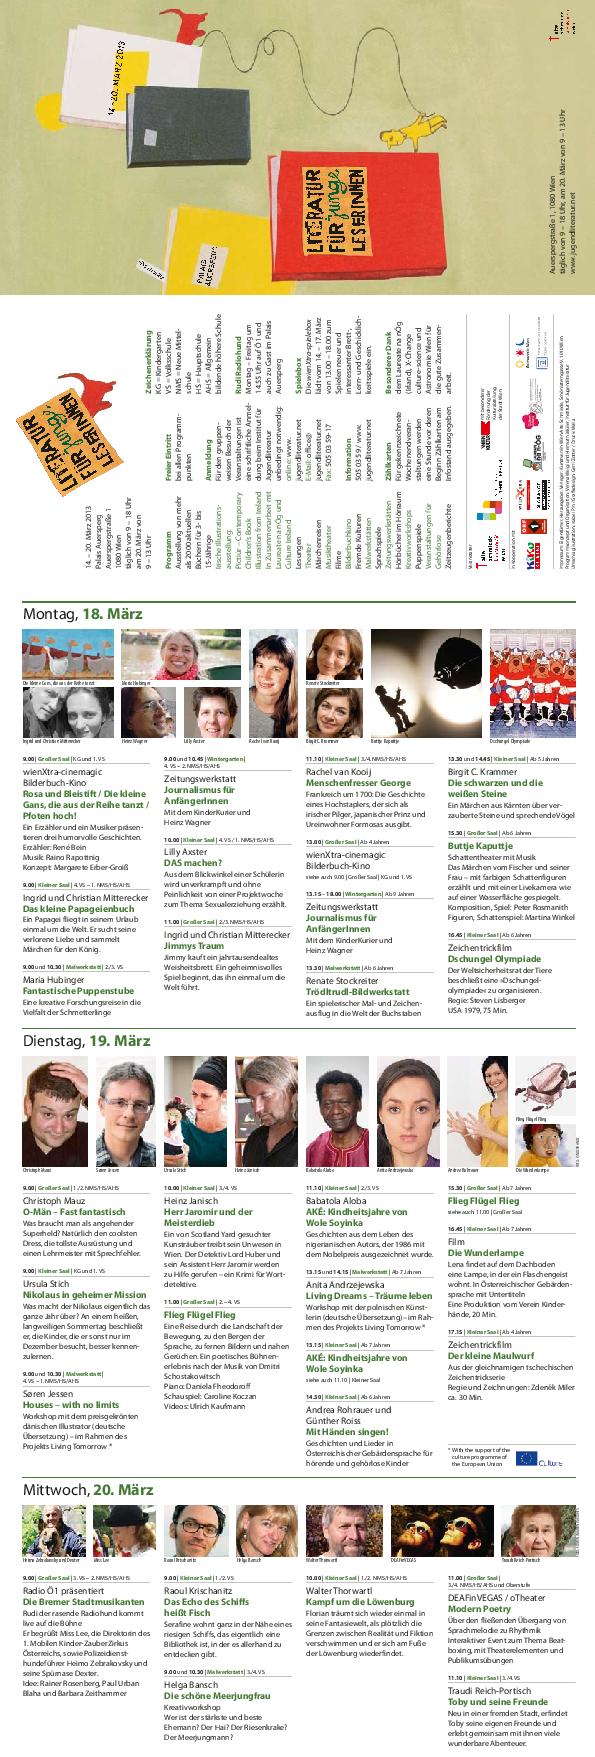 LfjL_Programmfolder_2013_final_Lowres.pdf